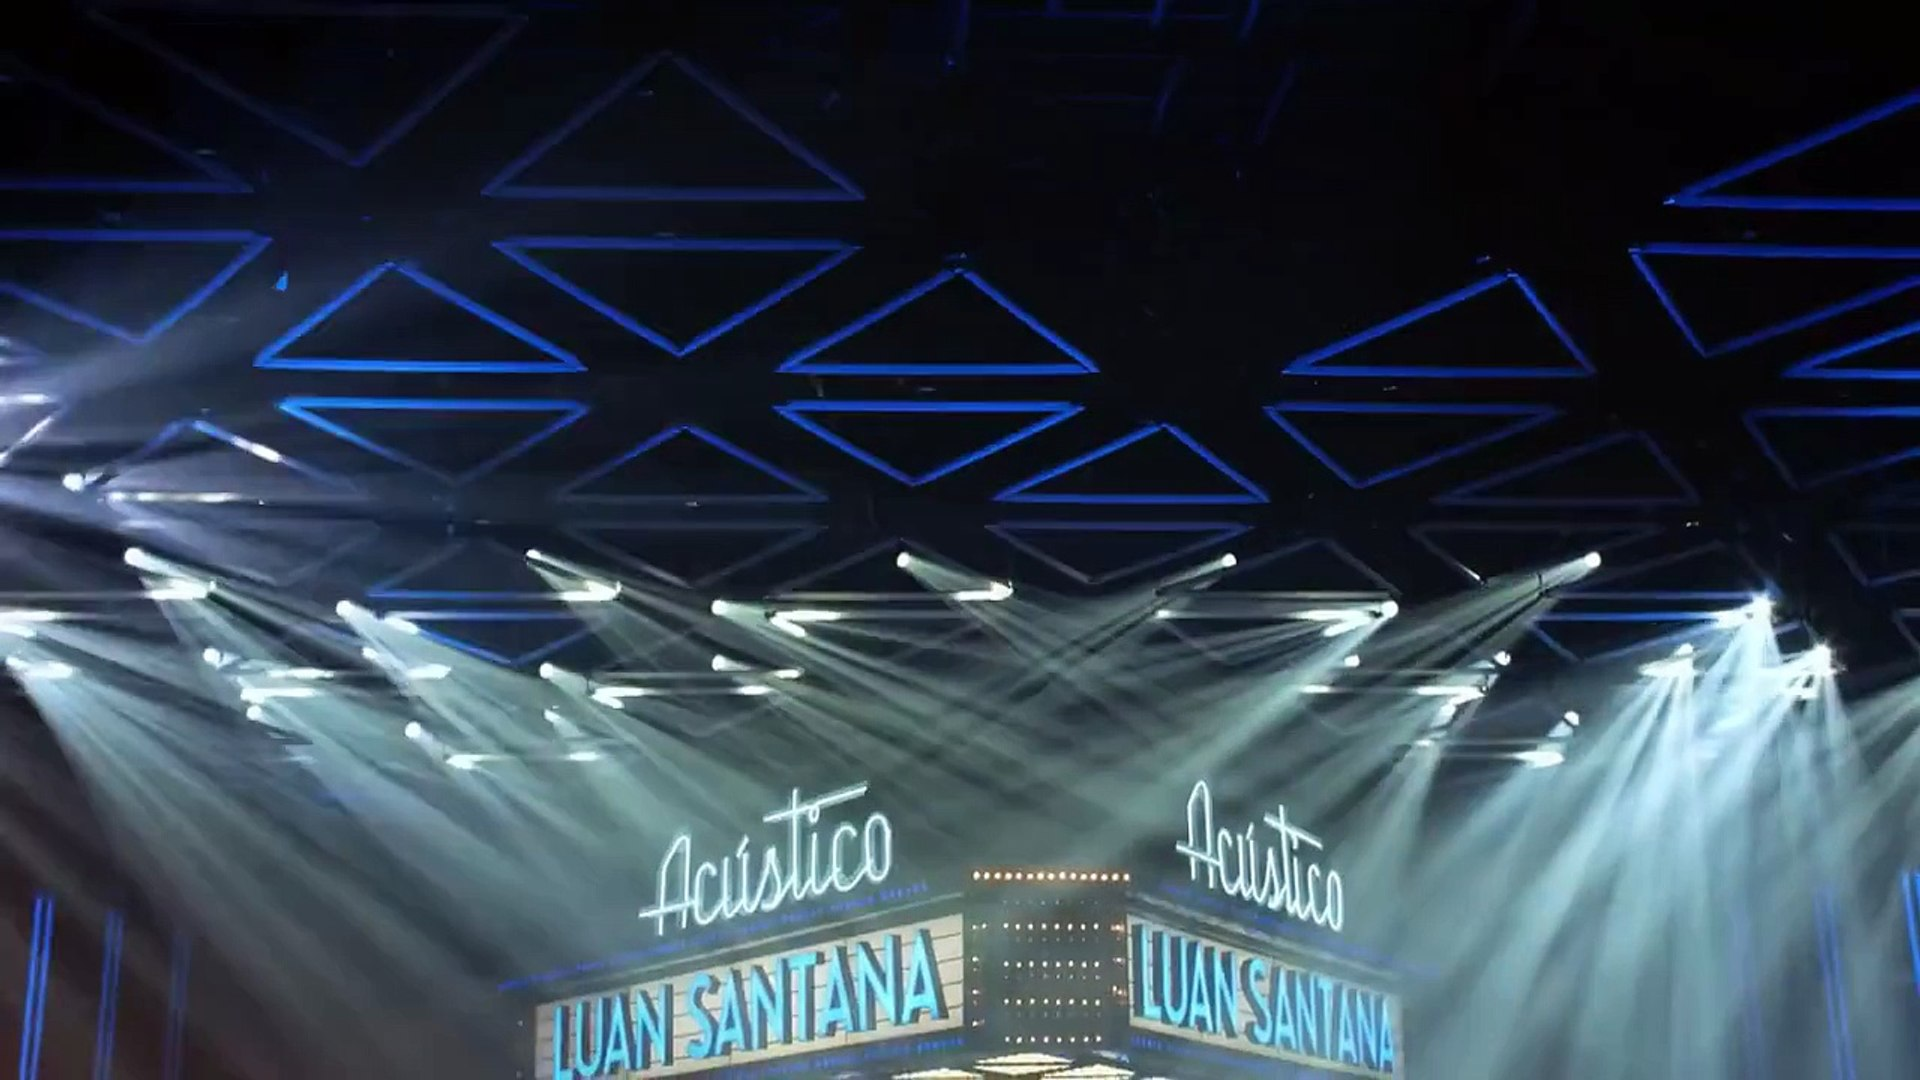 Luan Santana - Escreve aí - (Vídeo Oficial) - -DVD Luan Santana Acústico-